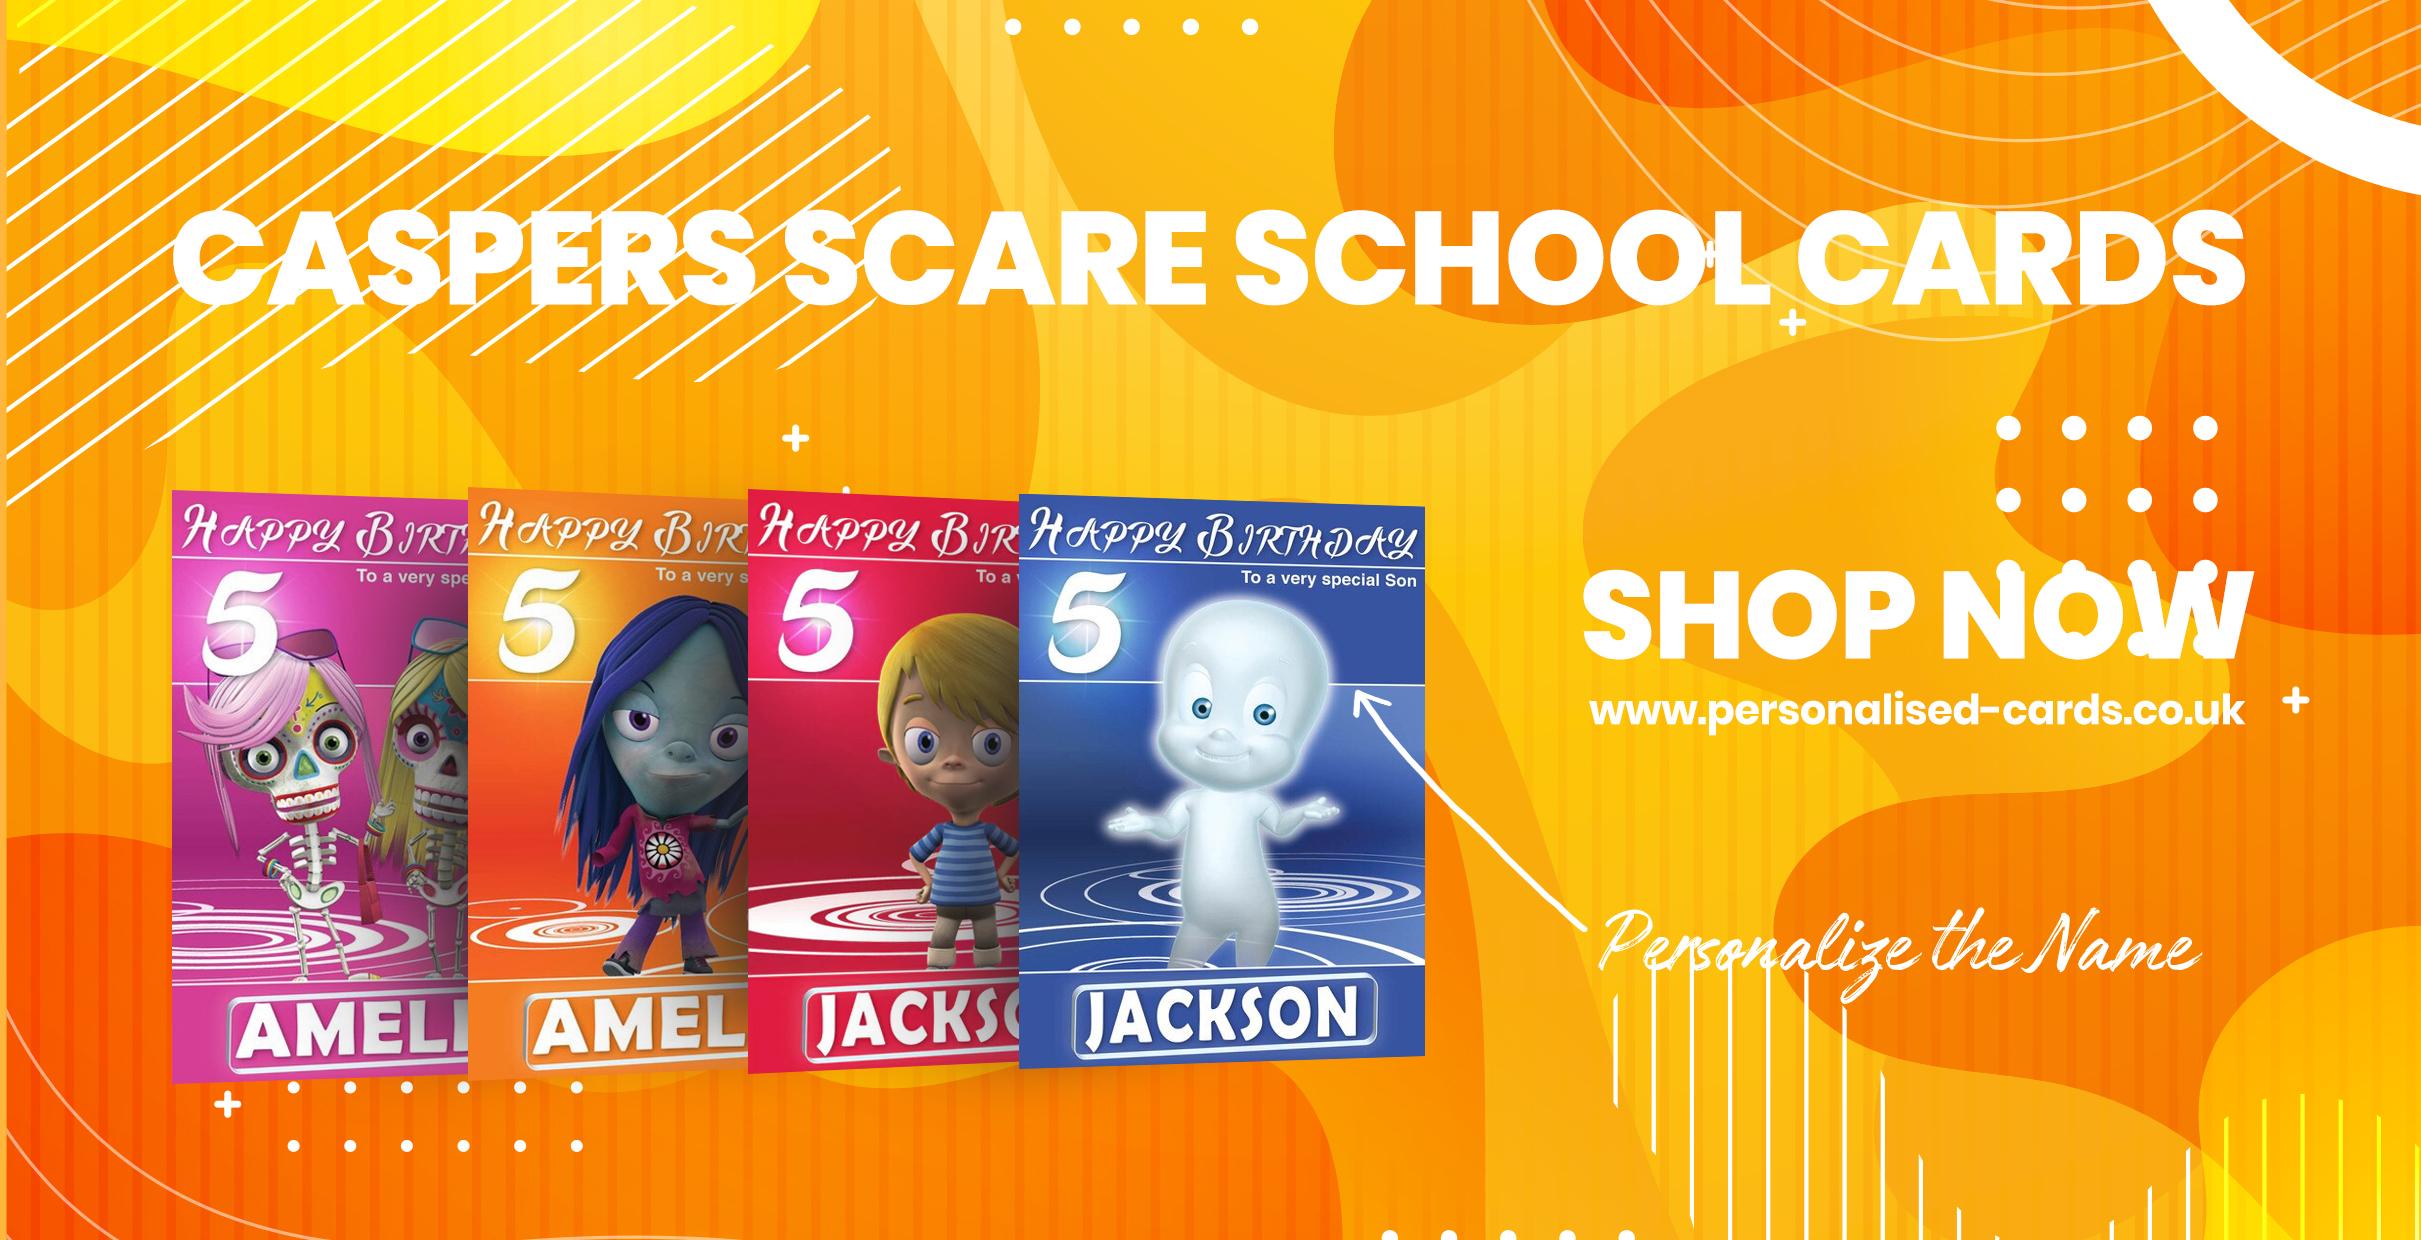 caspers-scare-school-cards.jpg